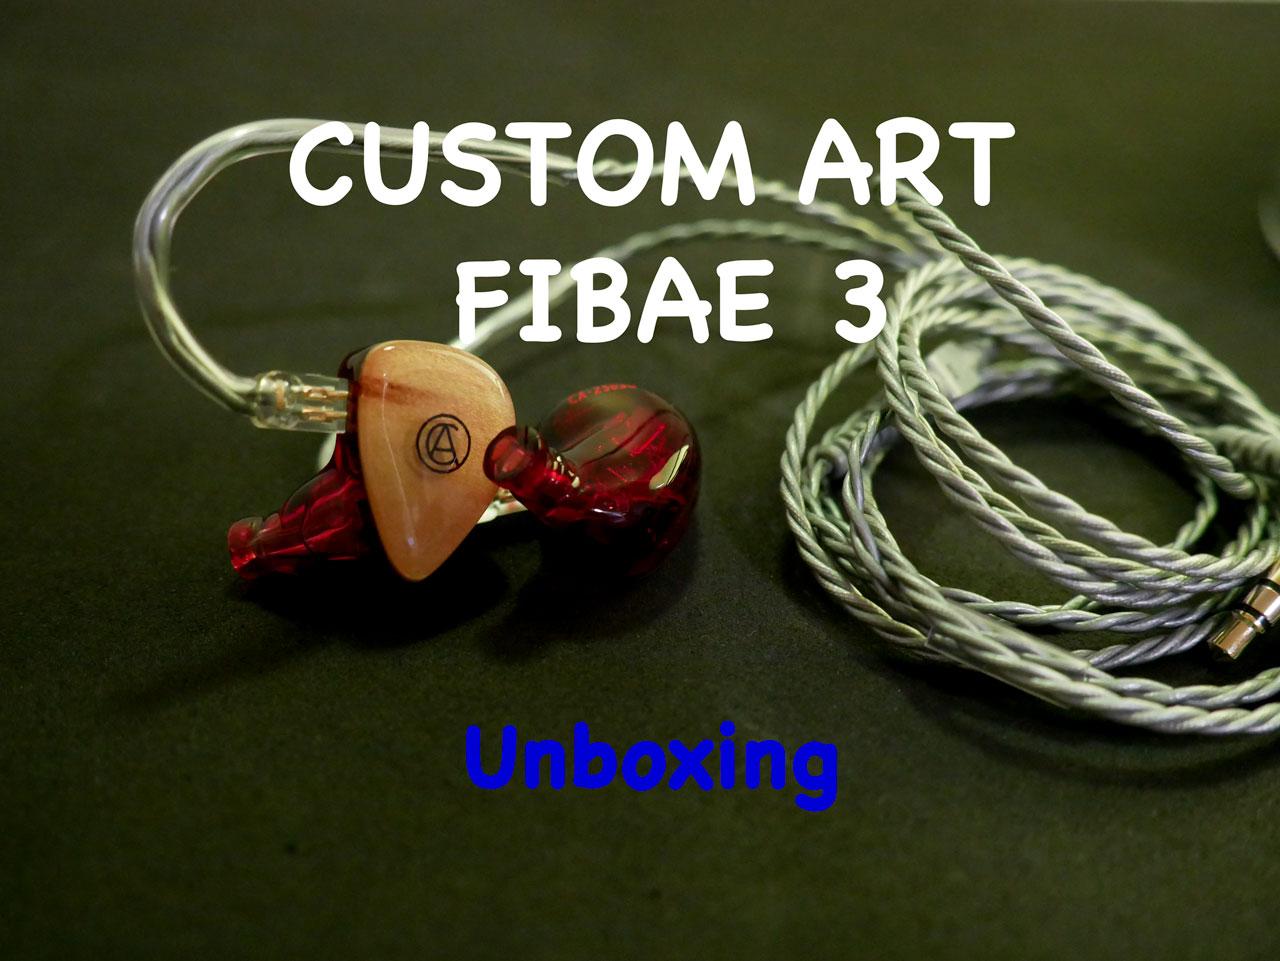 Custom Art Fibae 3 | Unboxing